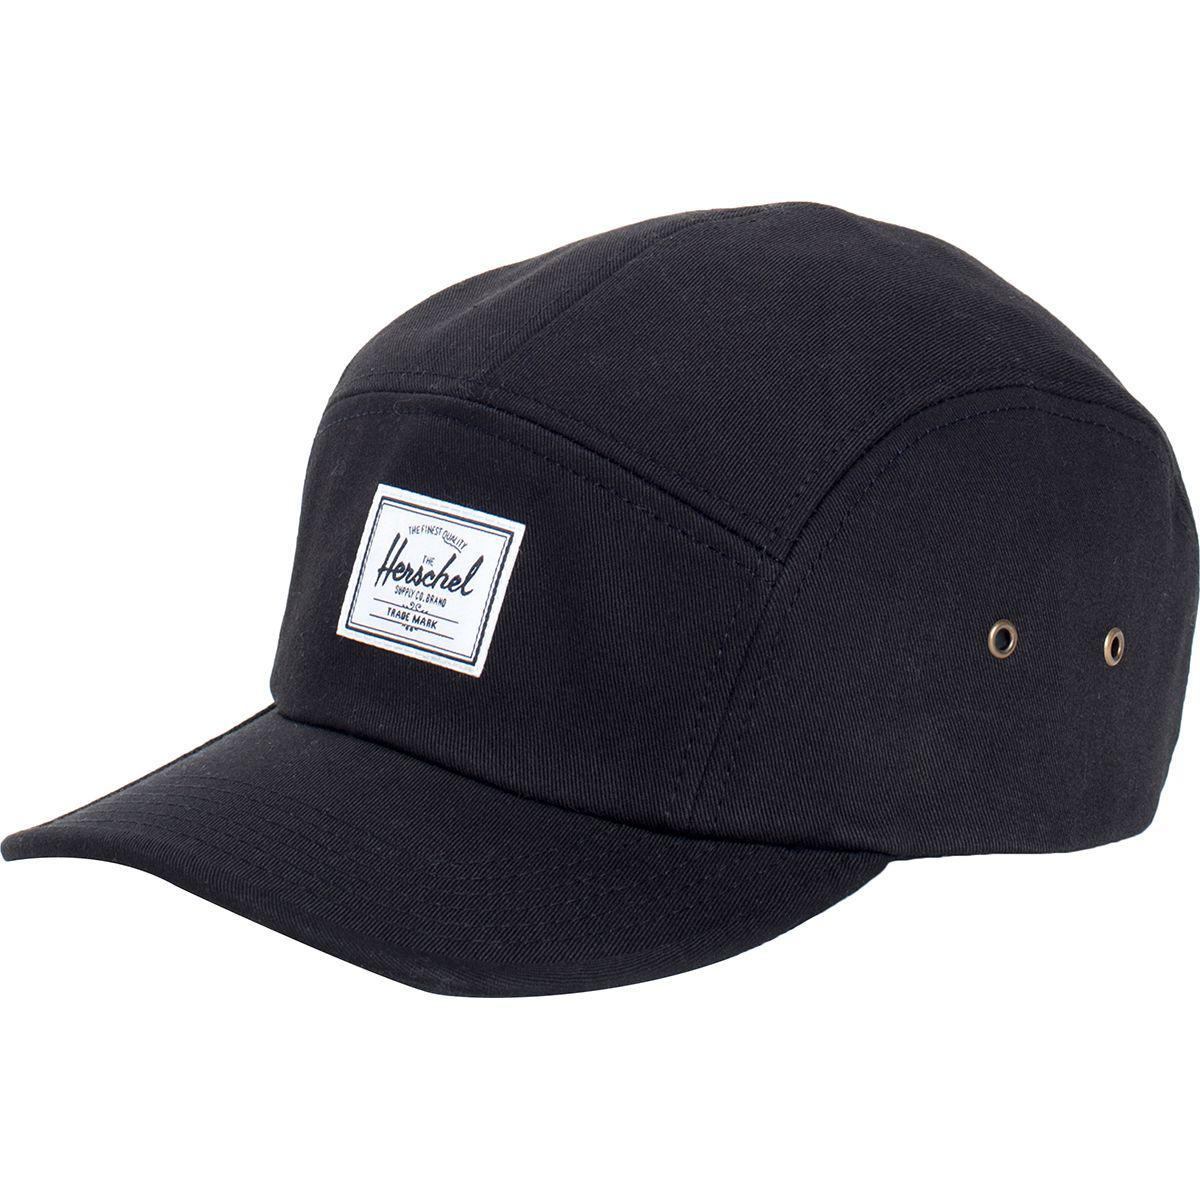 aa6c95c7 Lyst - Herschel Supply Co. Glendale 5-panel Hat in Black for Men